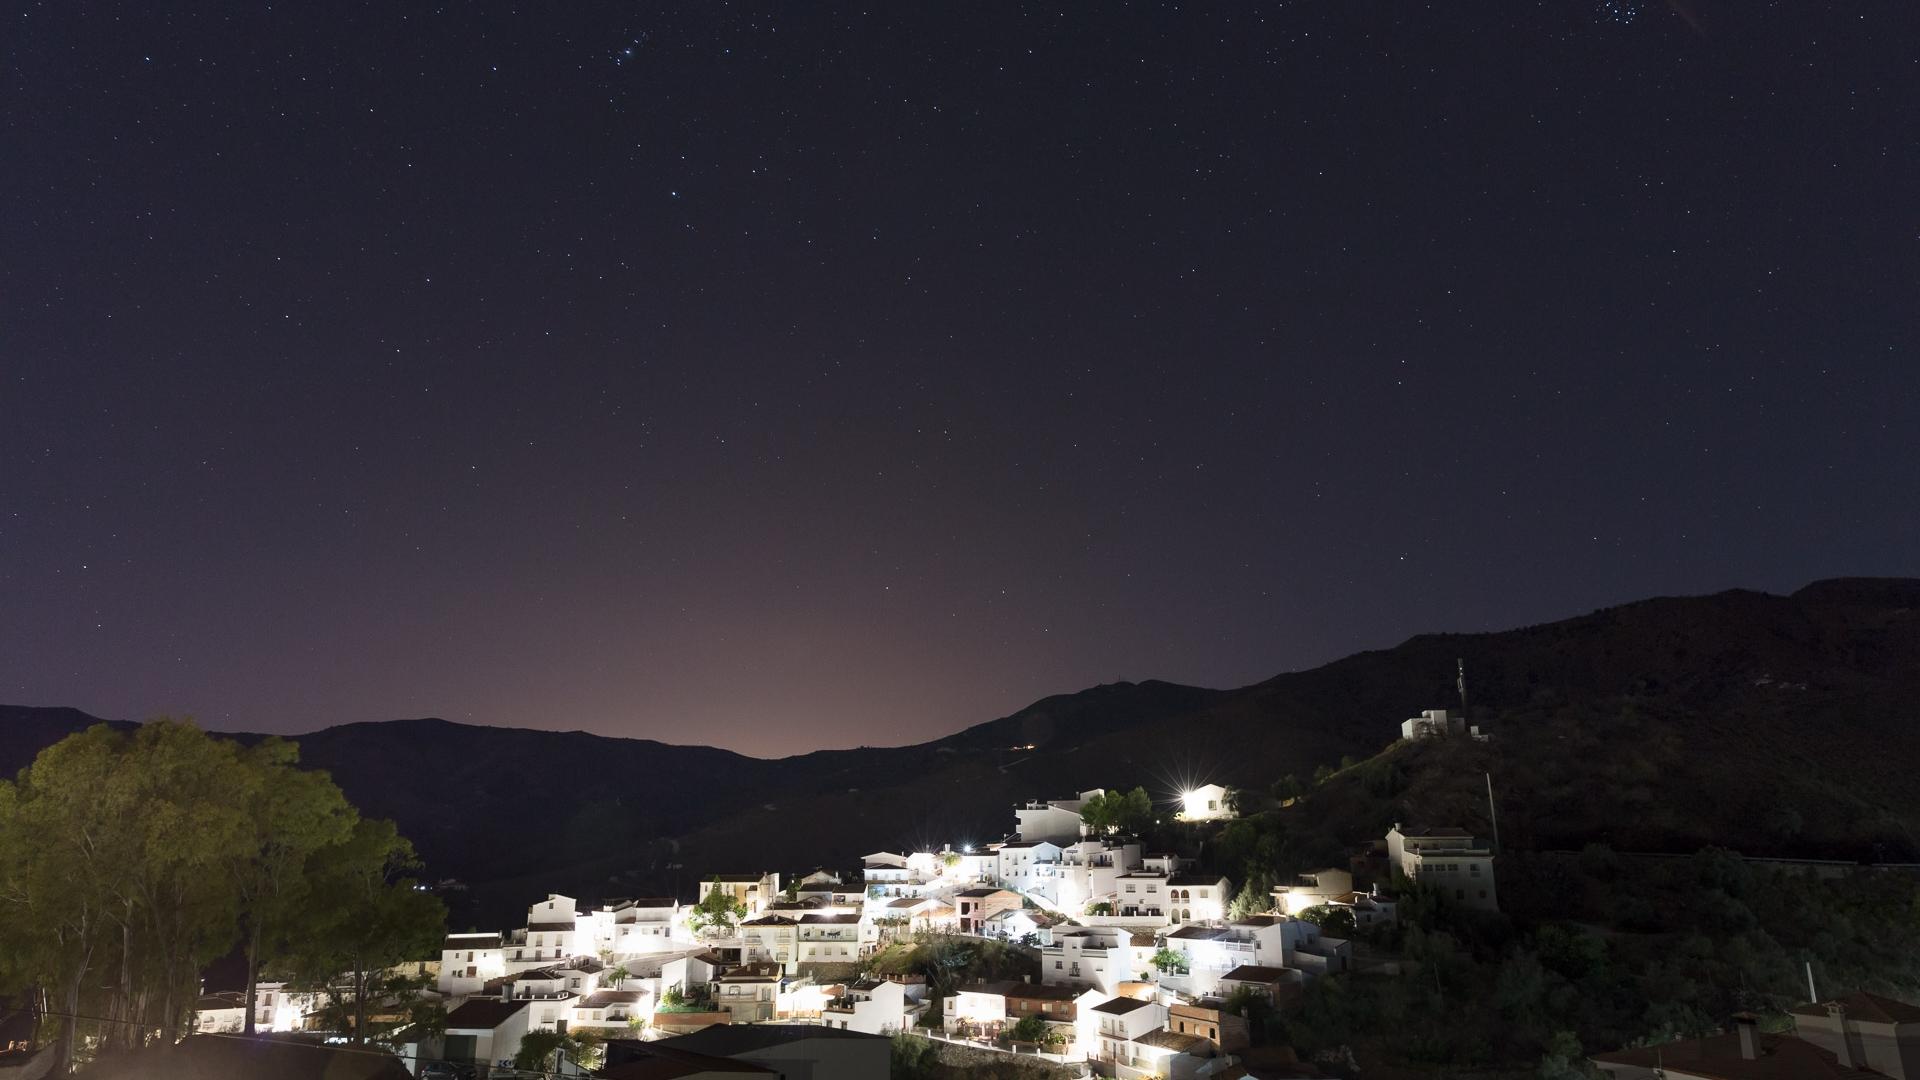 Nachtopname van het dorp El Borge